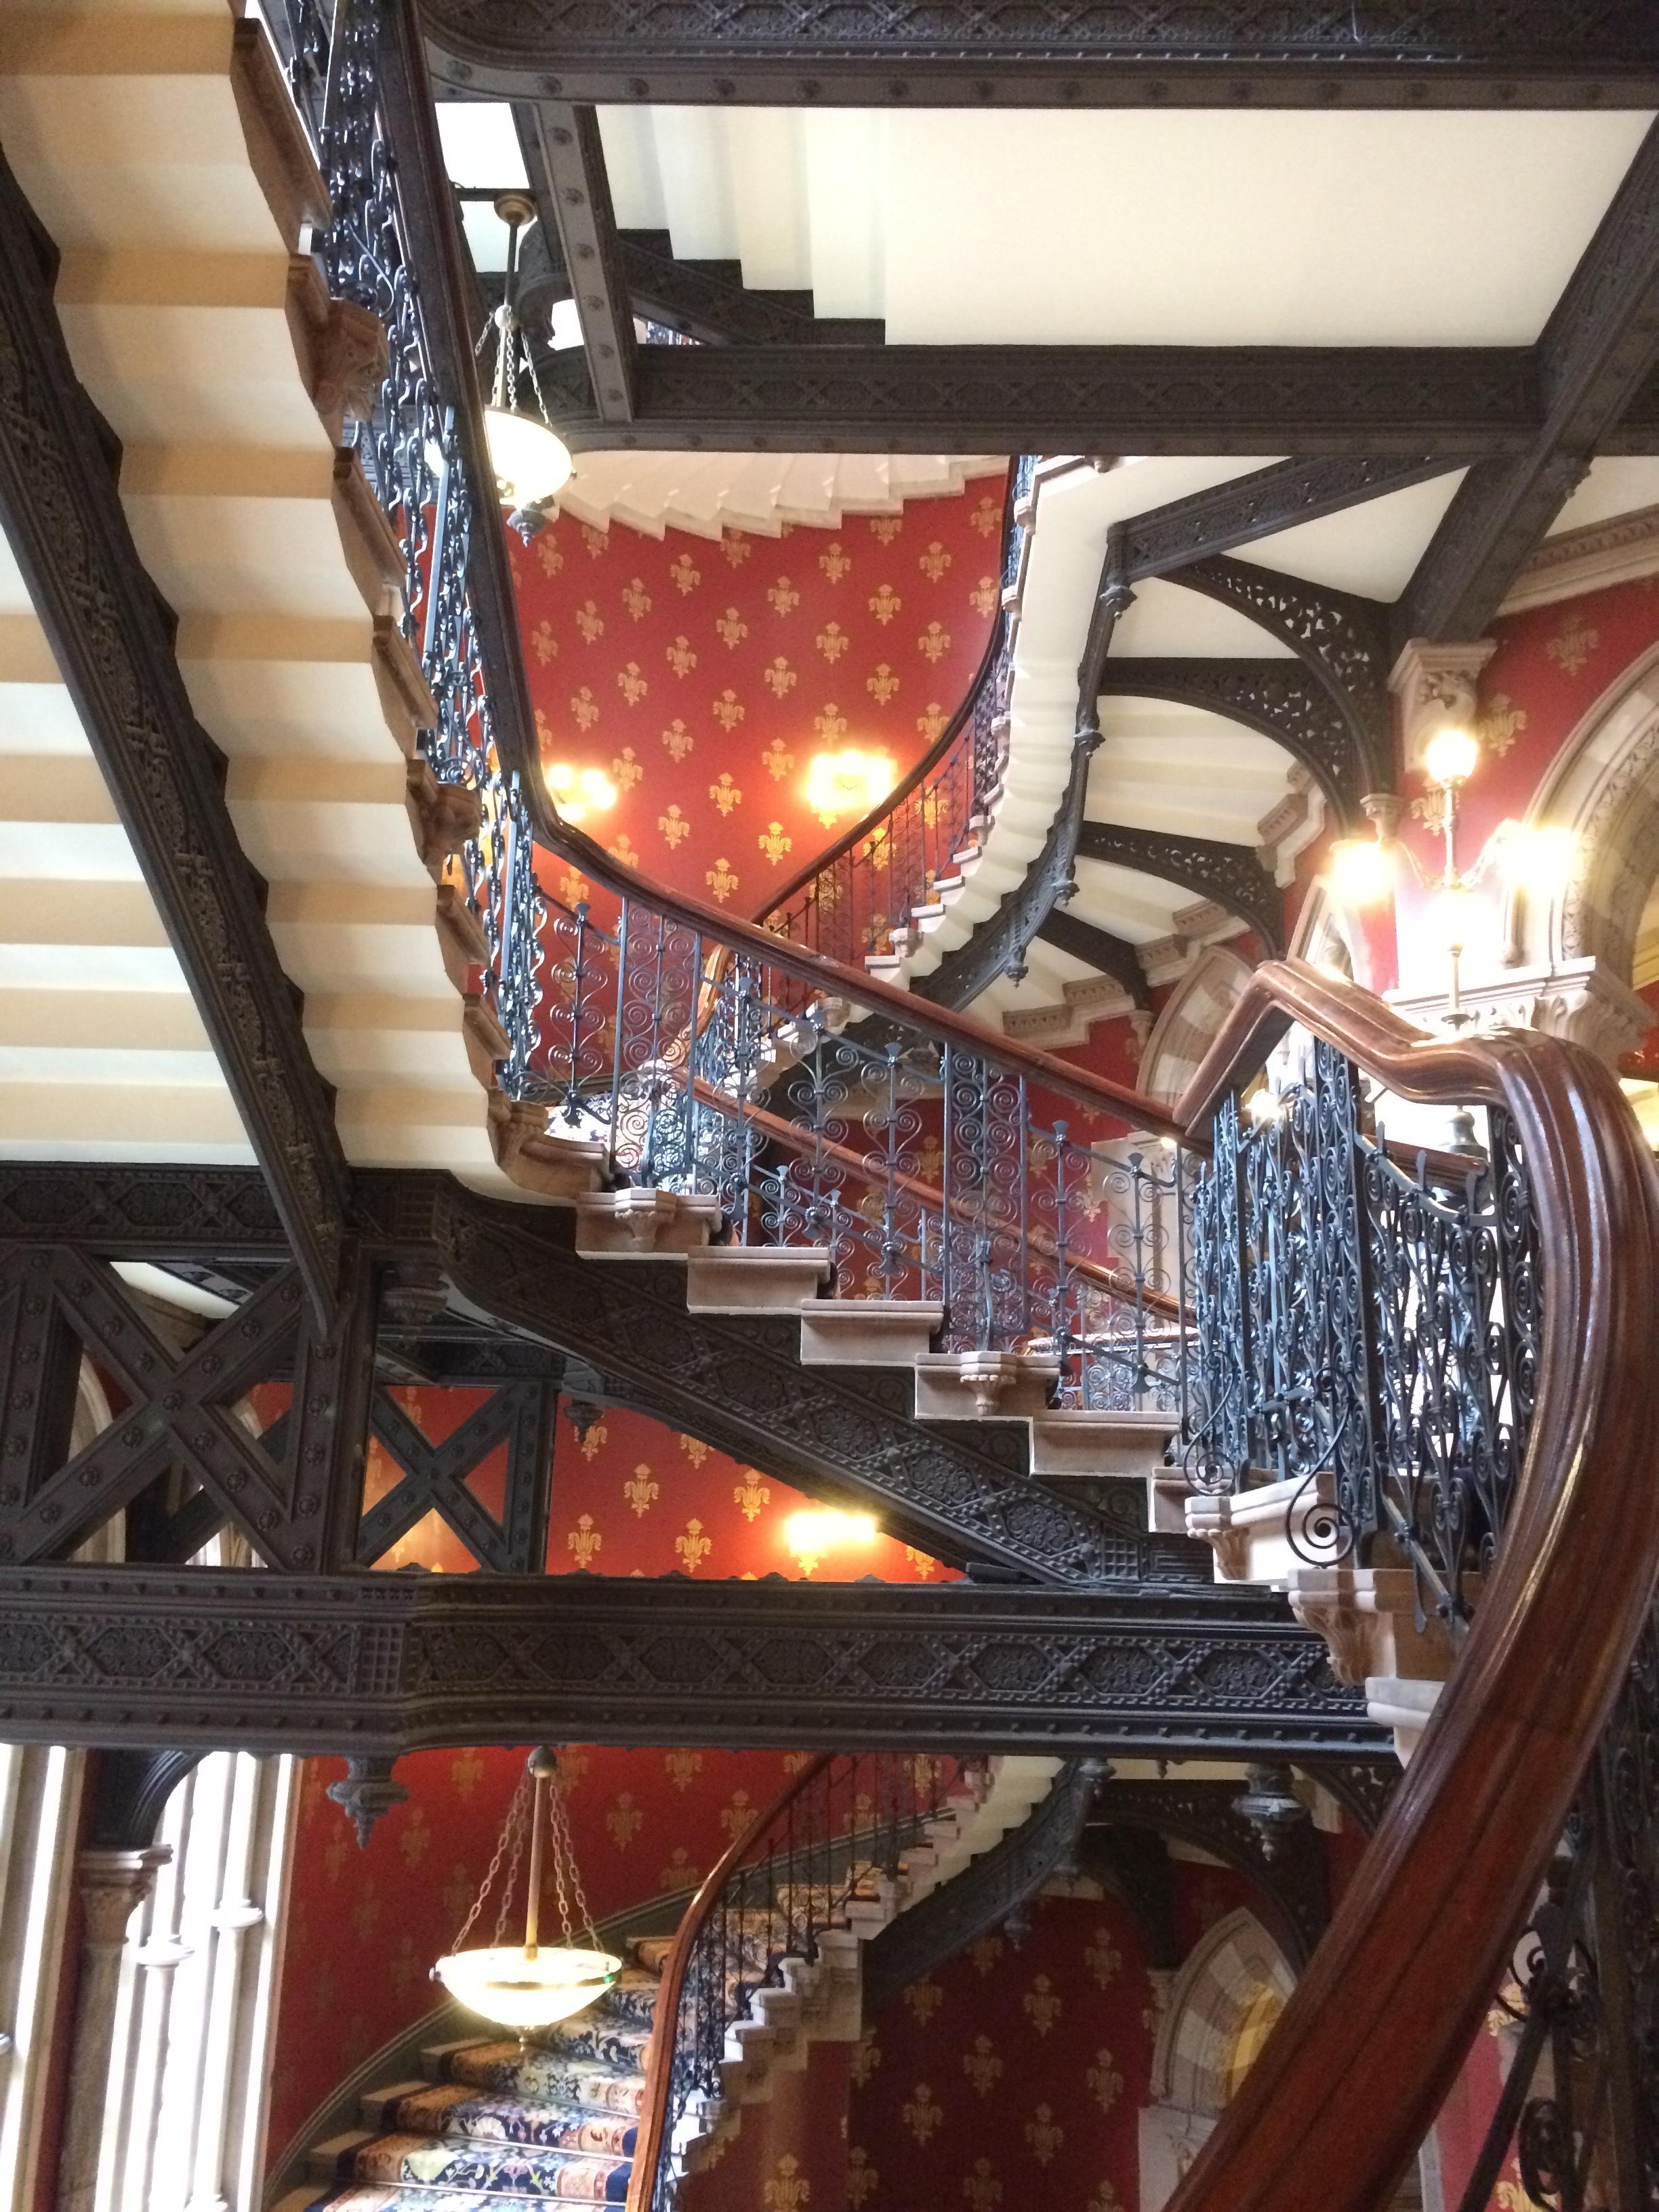 st pancras hotel stair.JPG